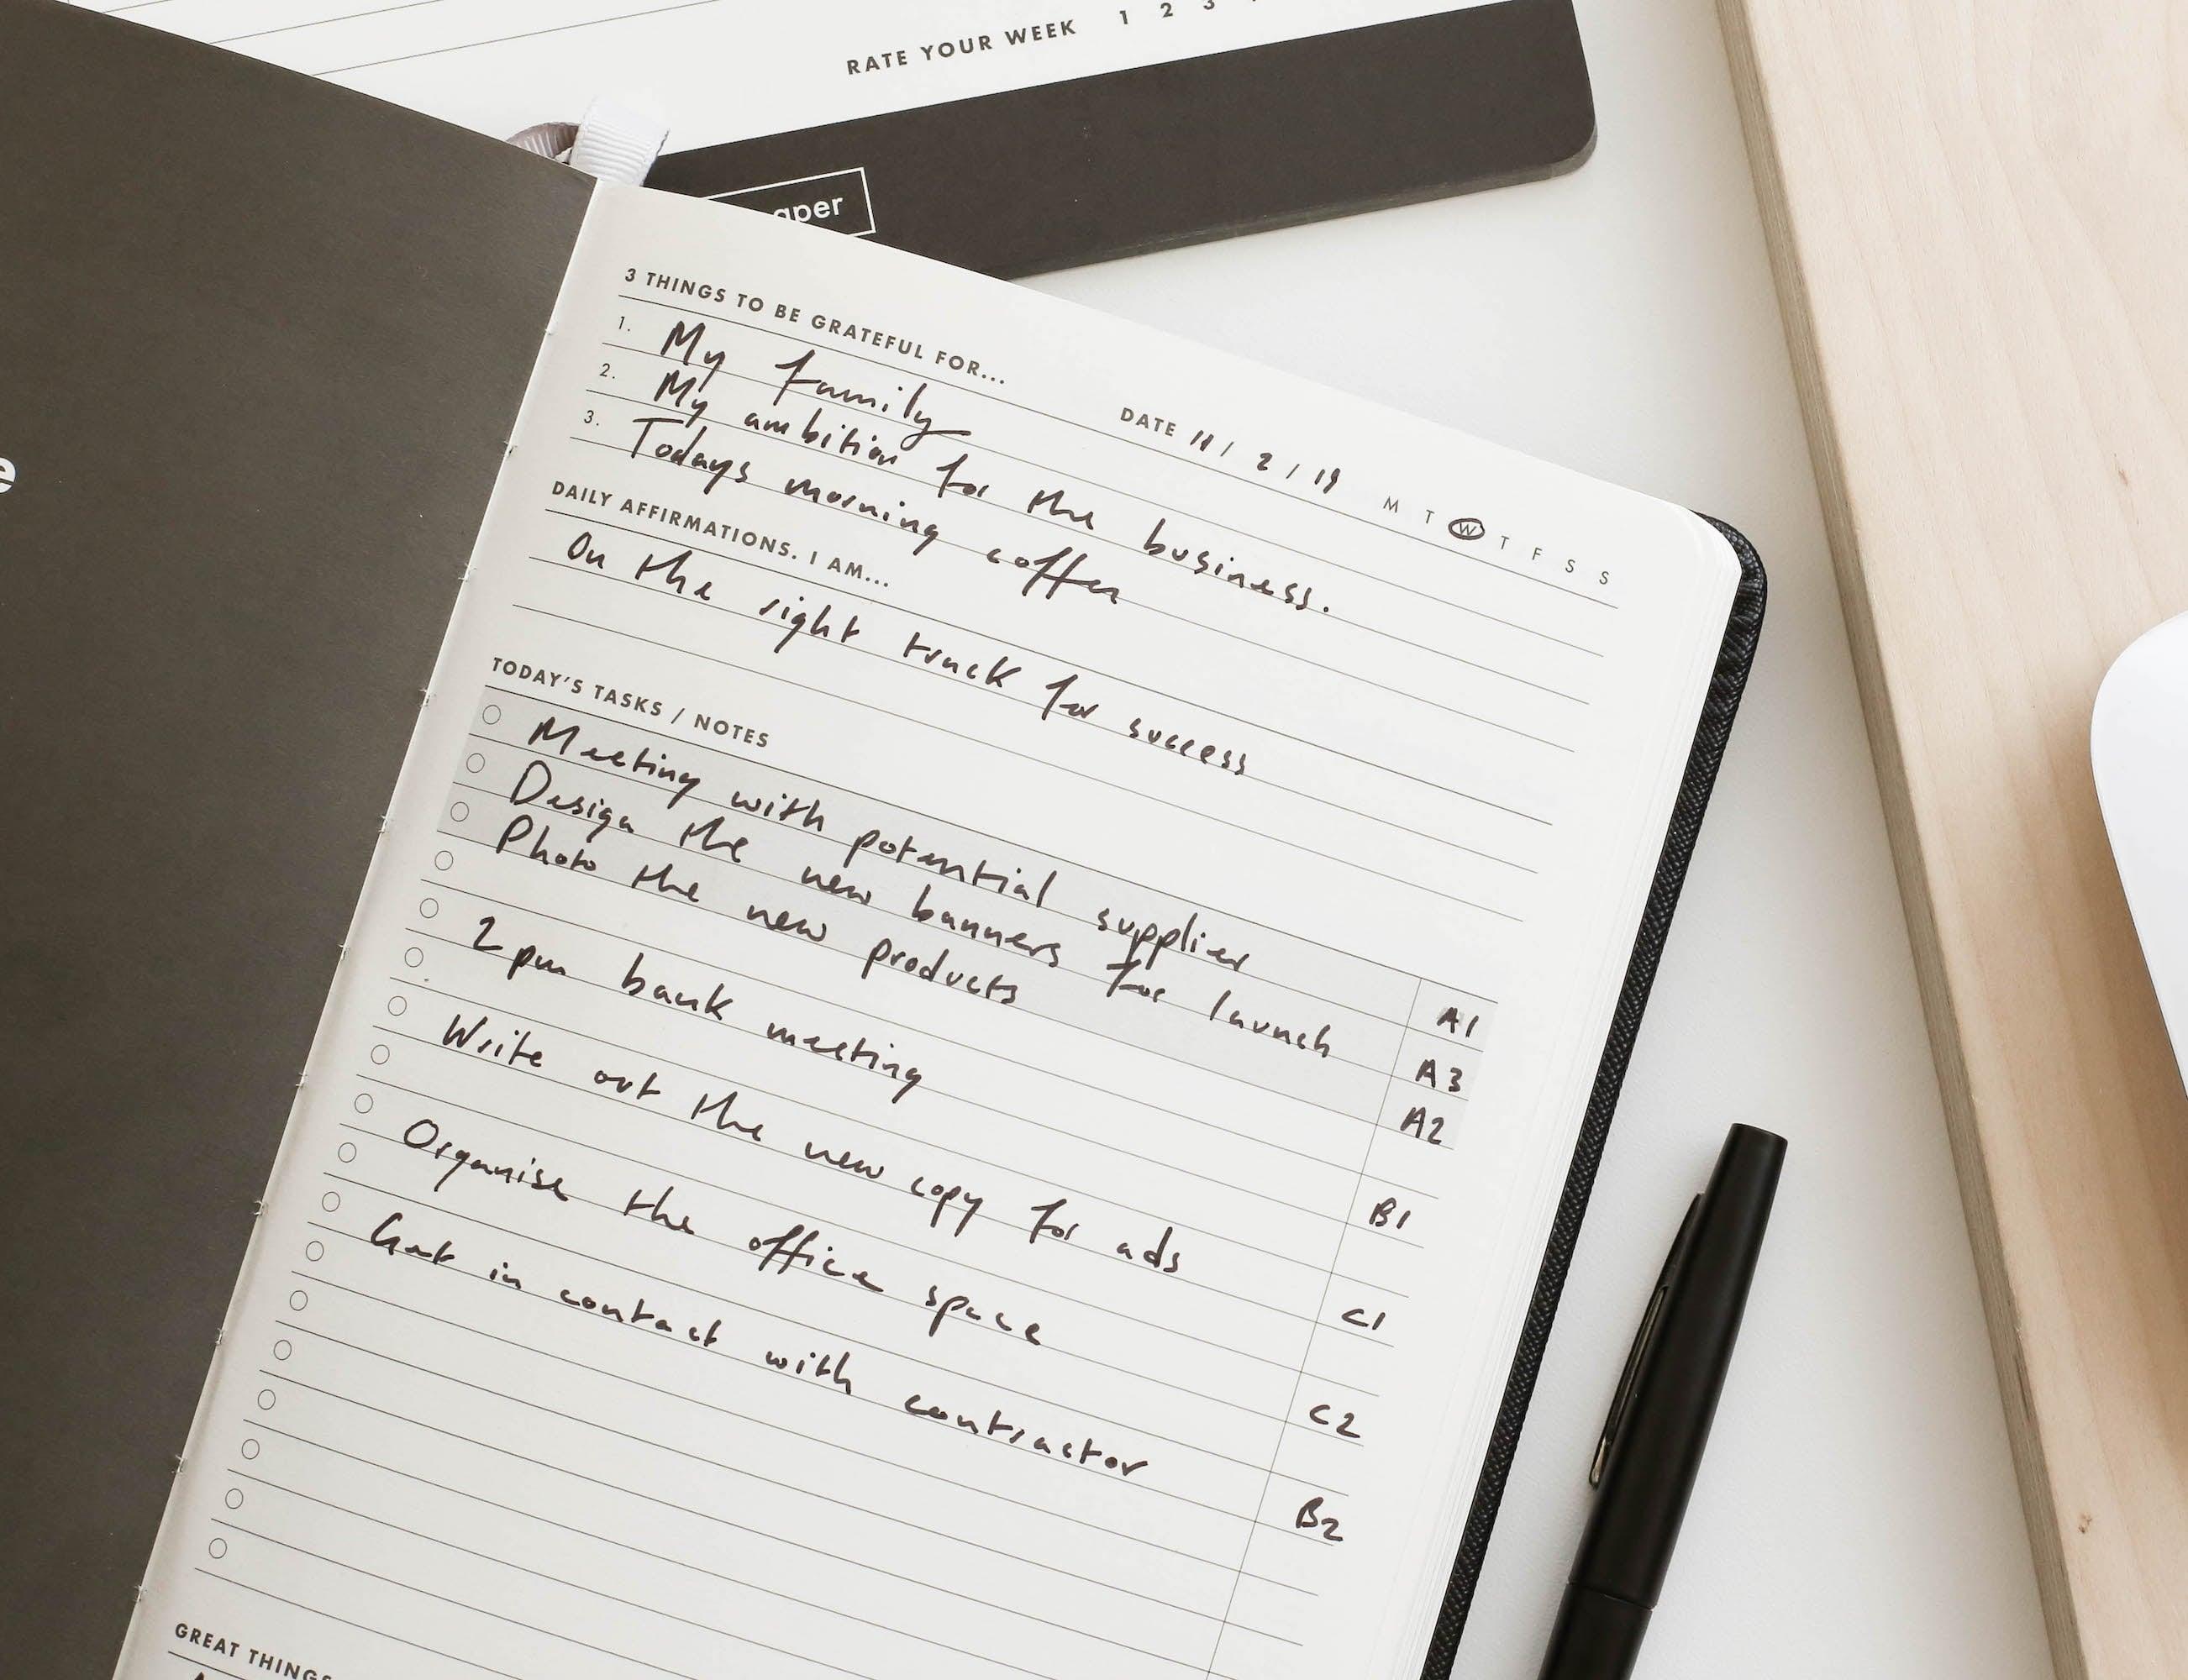 Daily Goal Setter Productivity & Gratitude Planner creates actionable tasks